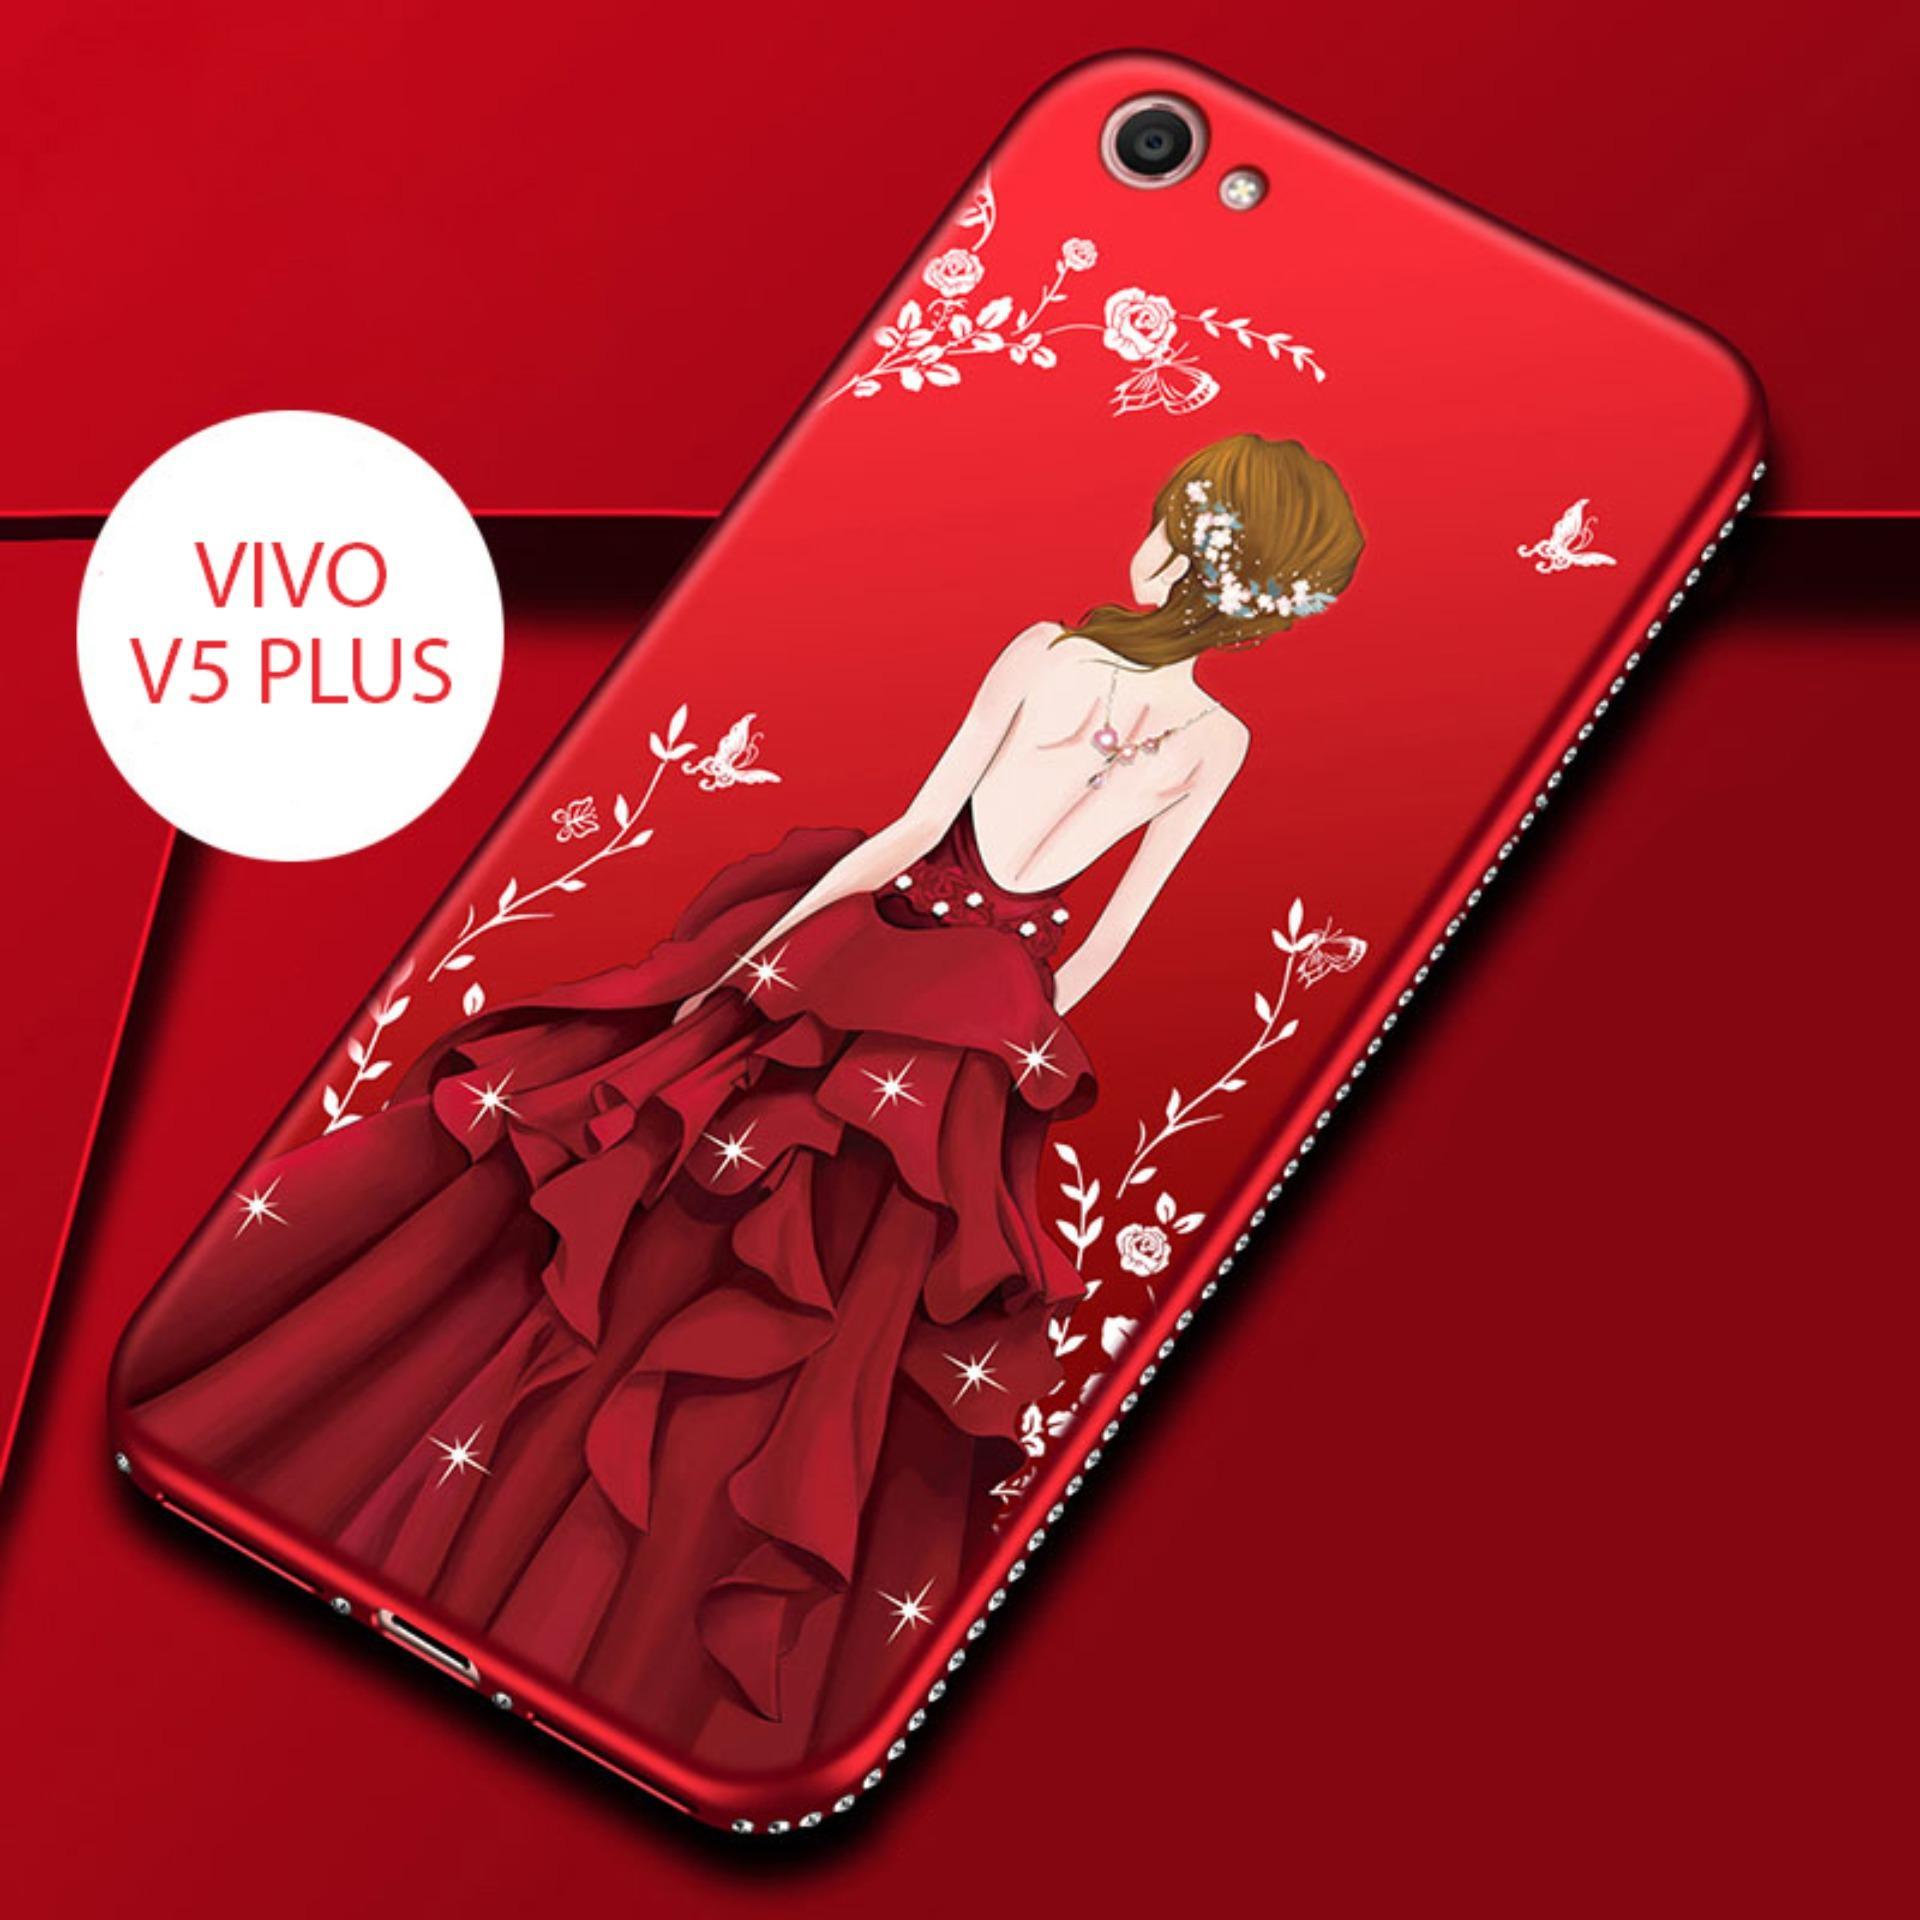 CASE VIVO V5 PLUS LUXURY 3D GODDES RHINESTONE FRAME SILICONE SOFT BACK COVER RED DRESS PRINCESS